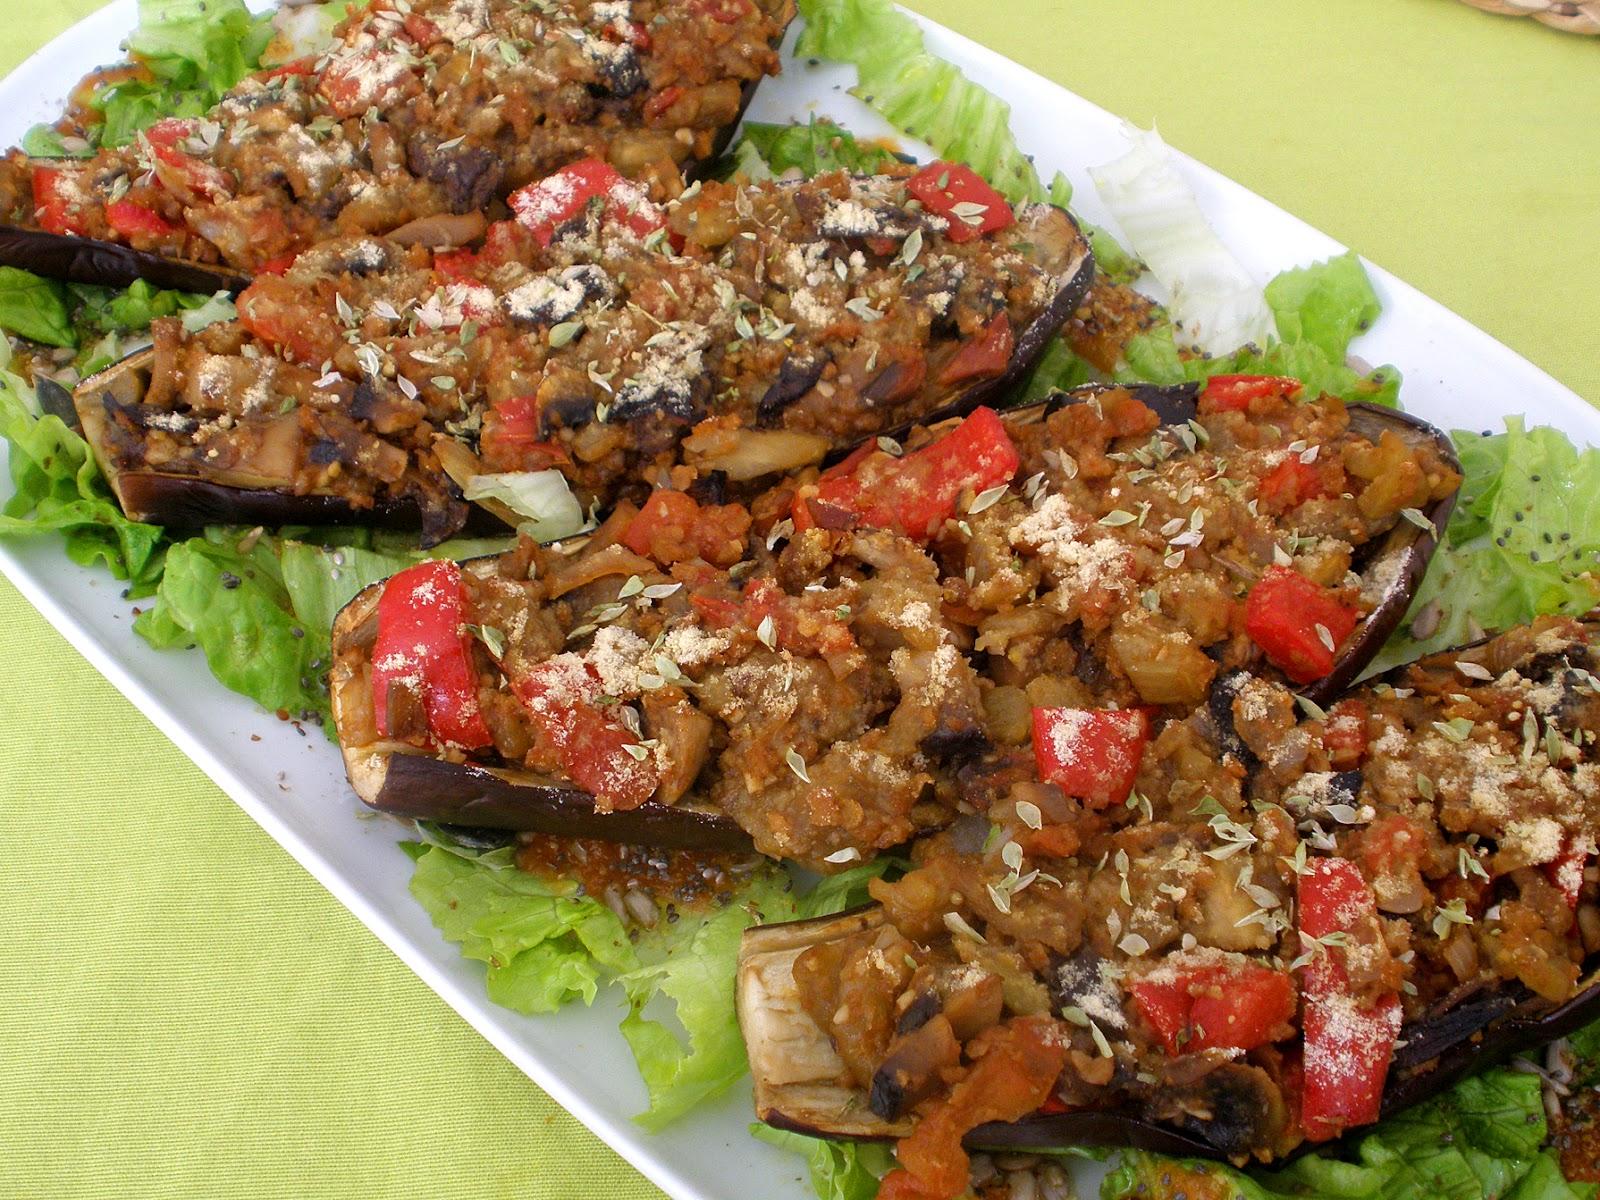 Cocina f cil vegana berenjenas rellenas for Cocina berenjenas rellenas